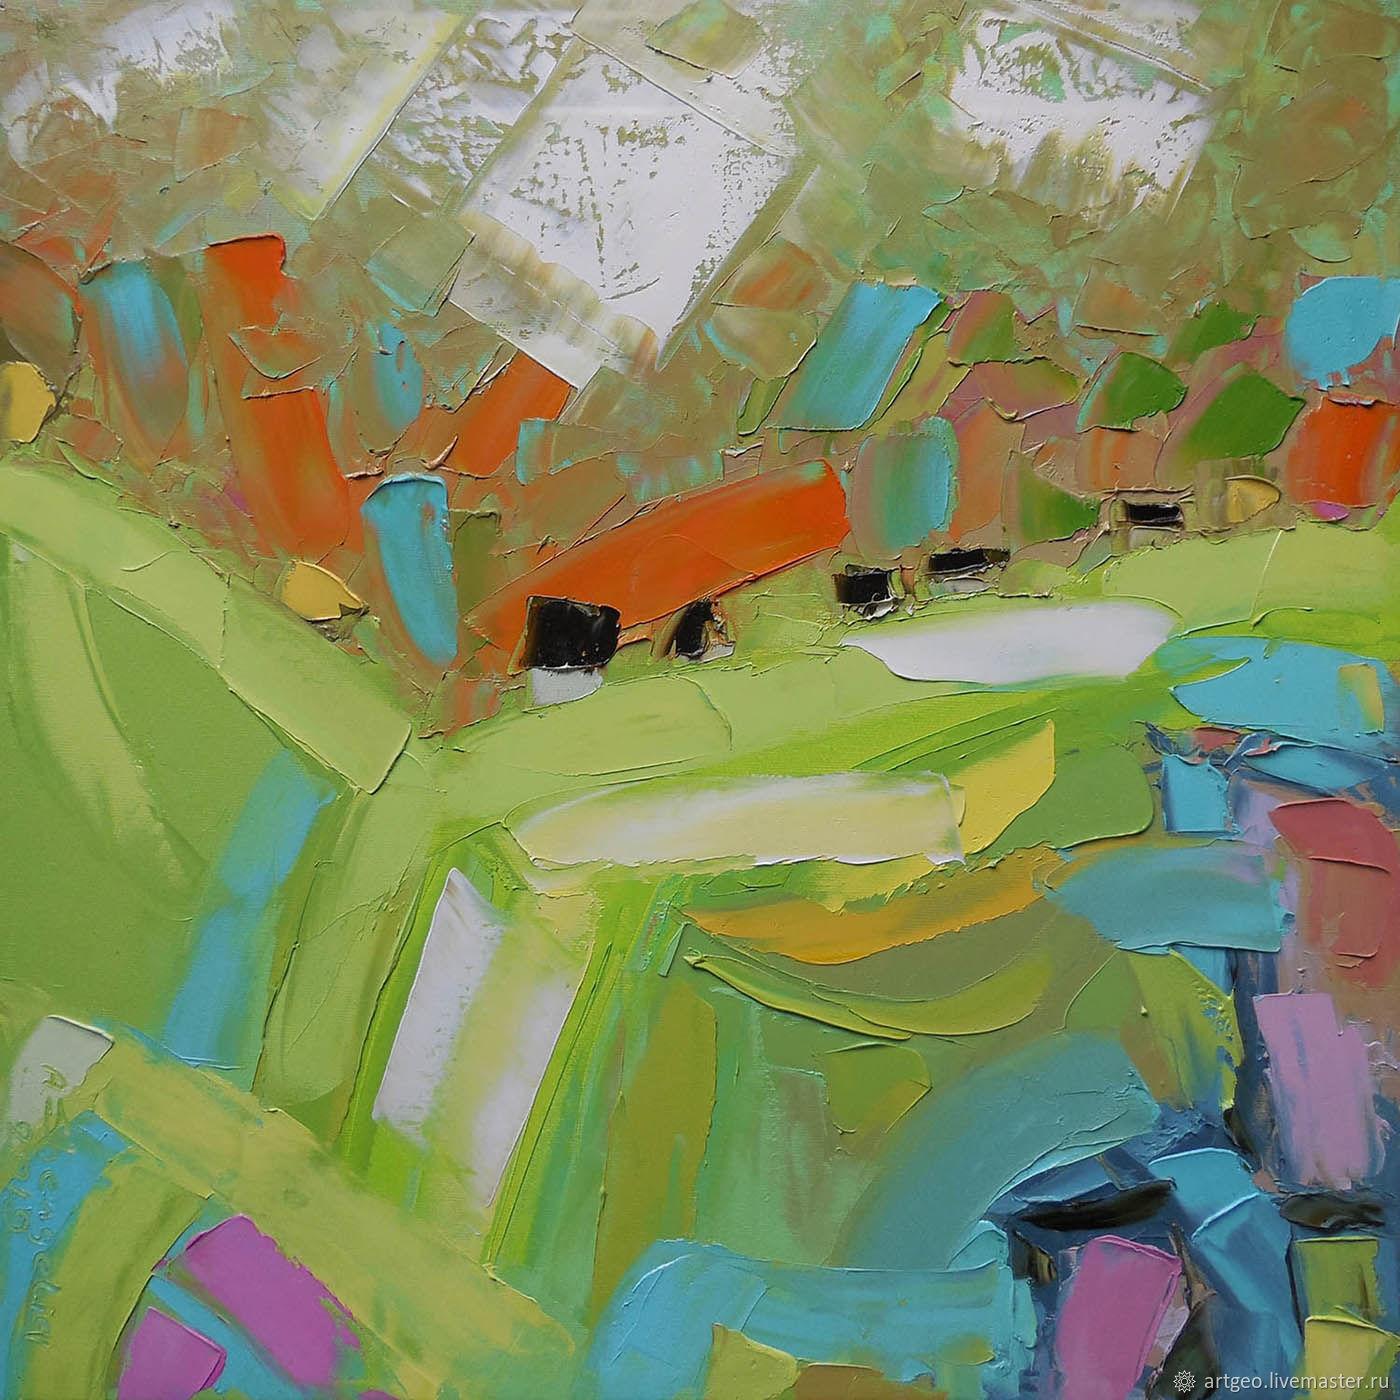 """Сезон винограда"" 50х50 см лофт картина маслом мастихином, Картины, Санкт-Петербург,  Фото №1"